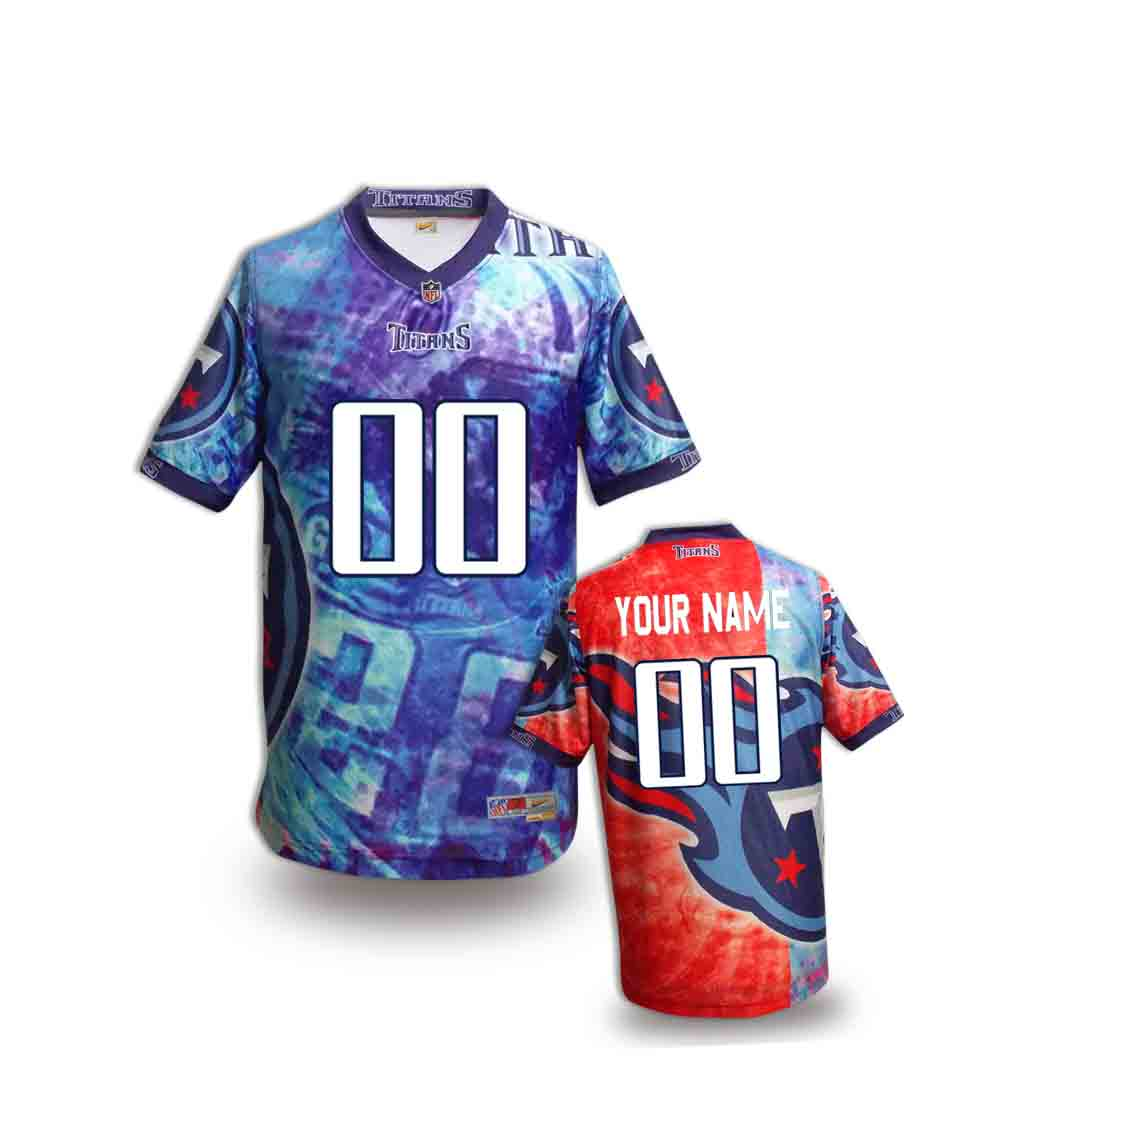 Nike Titans Customized Fashion Stitched Youth Jerseys05